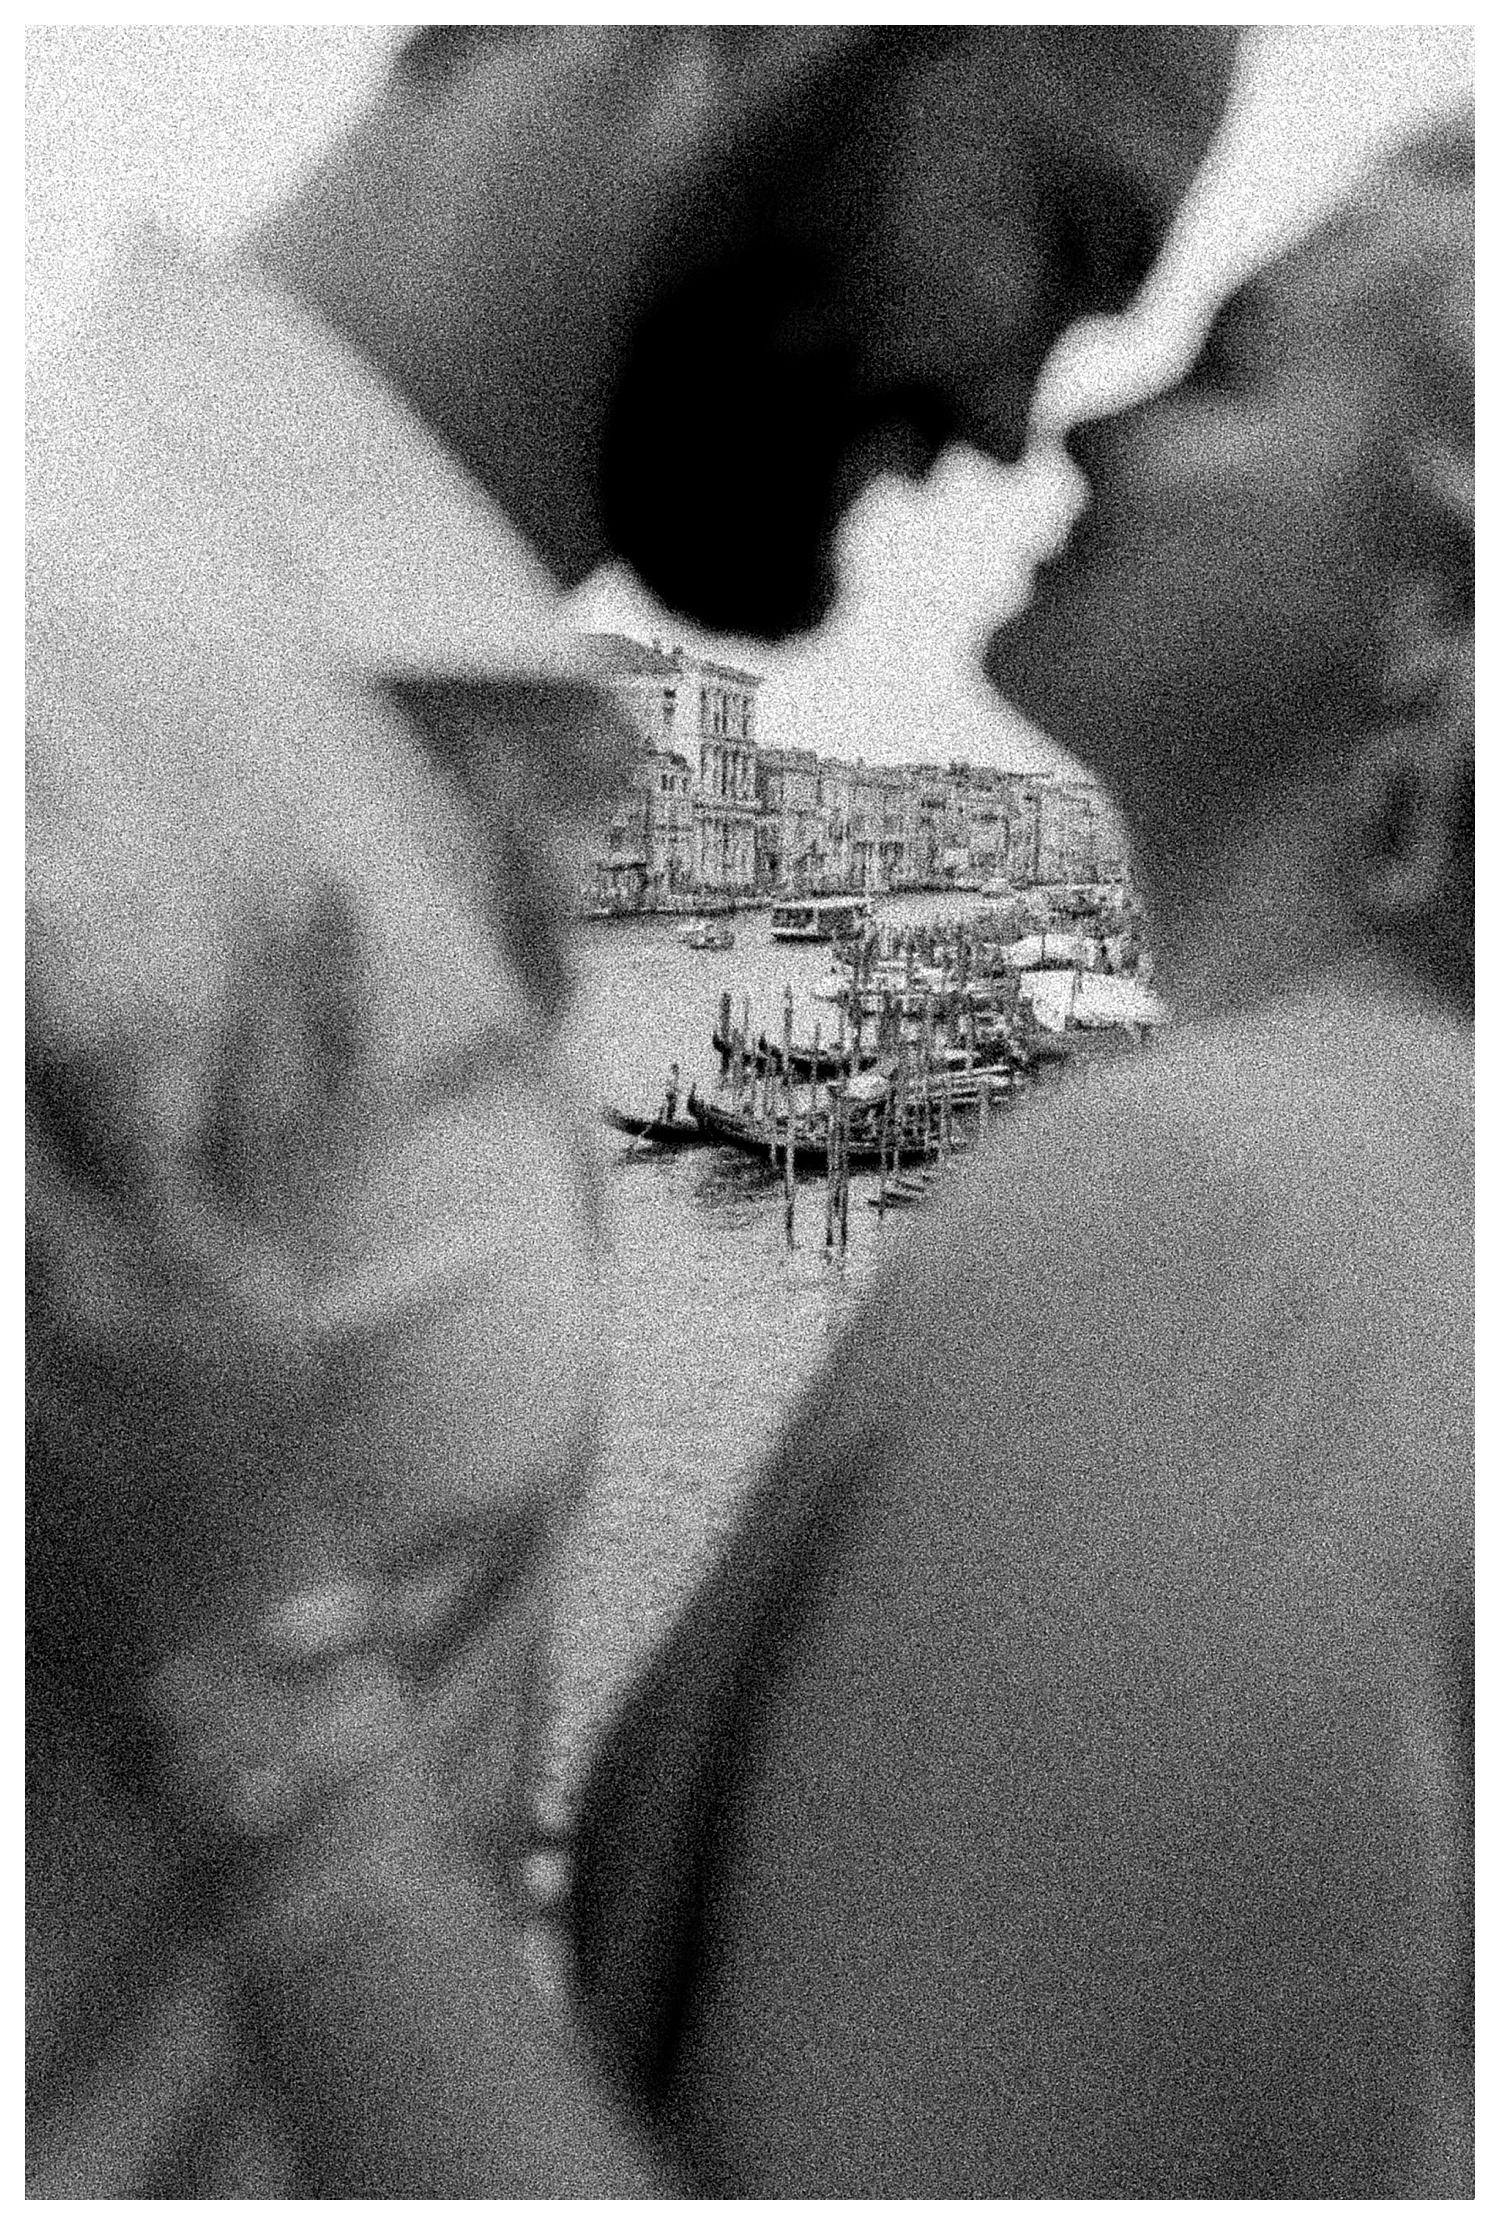 VENICE-COUPLE-PHOTOSHOOT-film-fuji-400h-stefano-degirmenci_0698.jpg